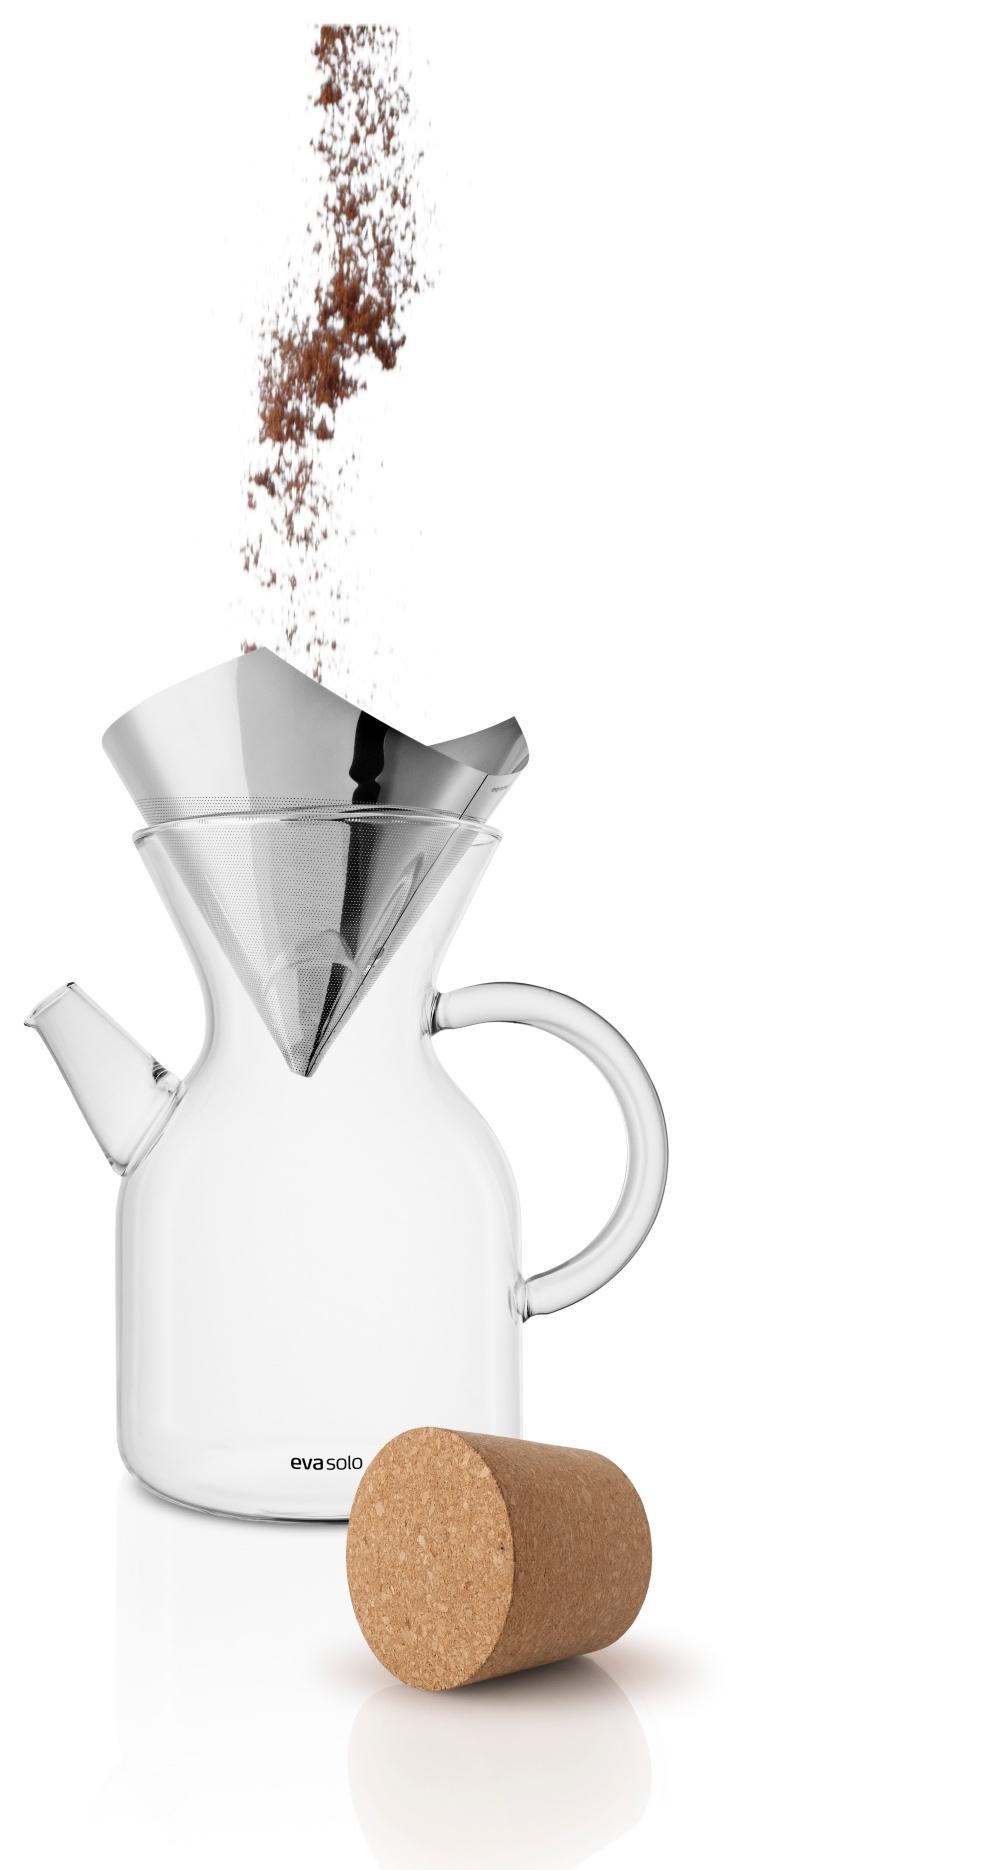 eva solo pour over kaffeebereiter kaffeepressen kaffeem hlen kaffee. Black Bedroom Furniture Sets. Home Design Ideas